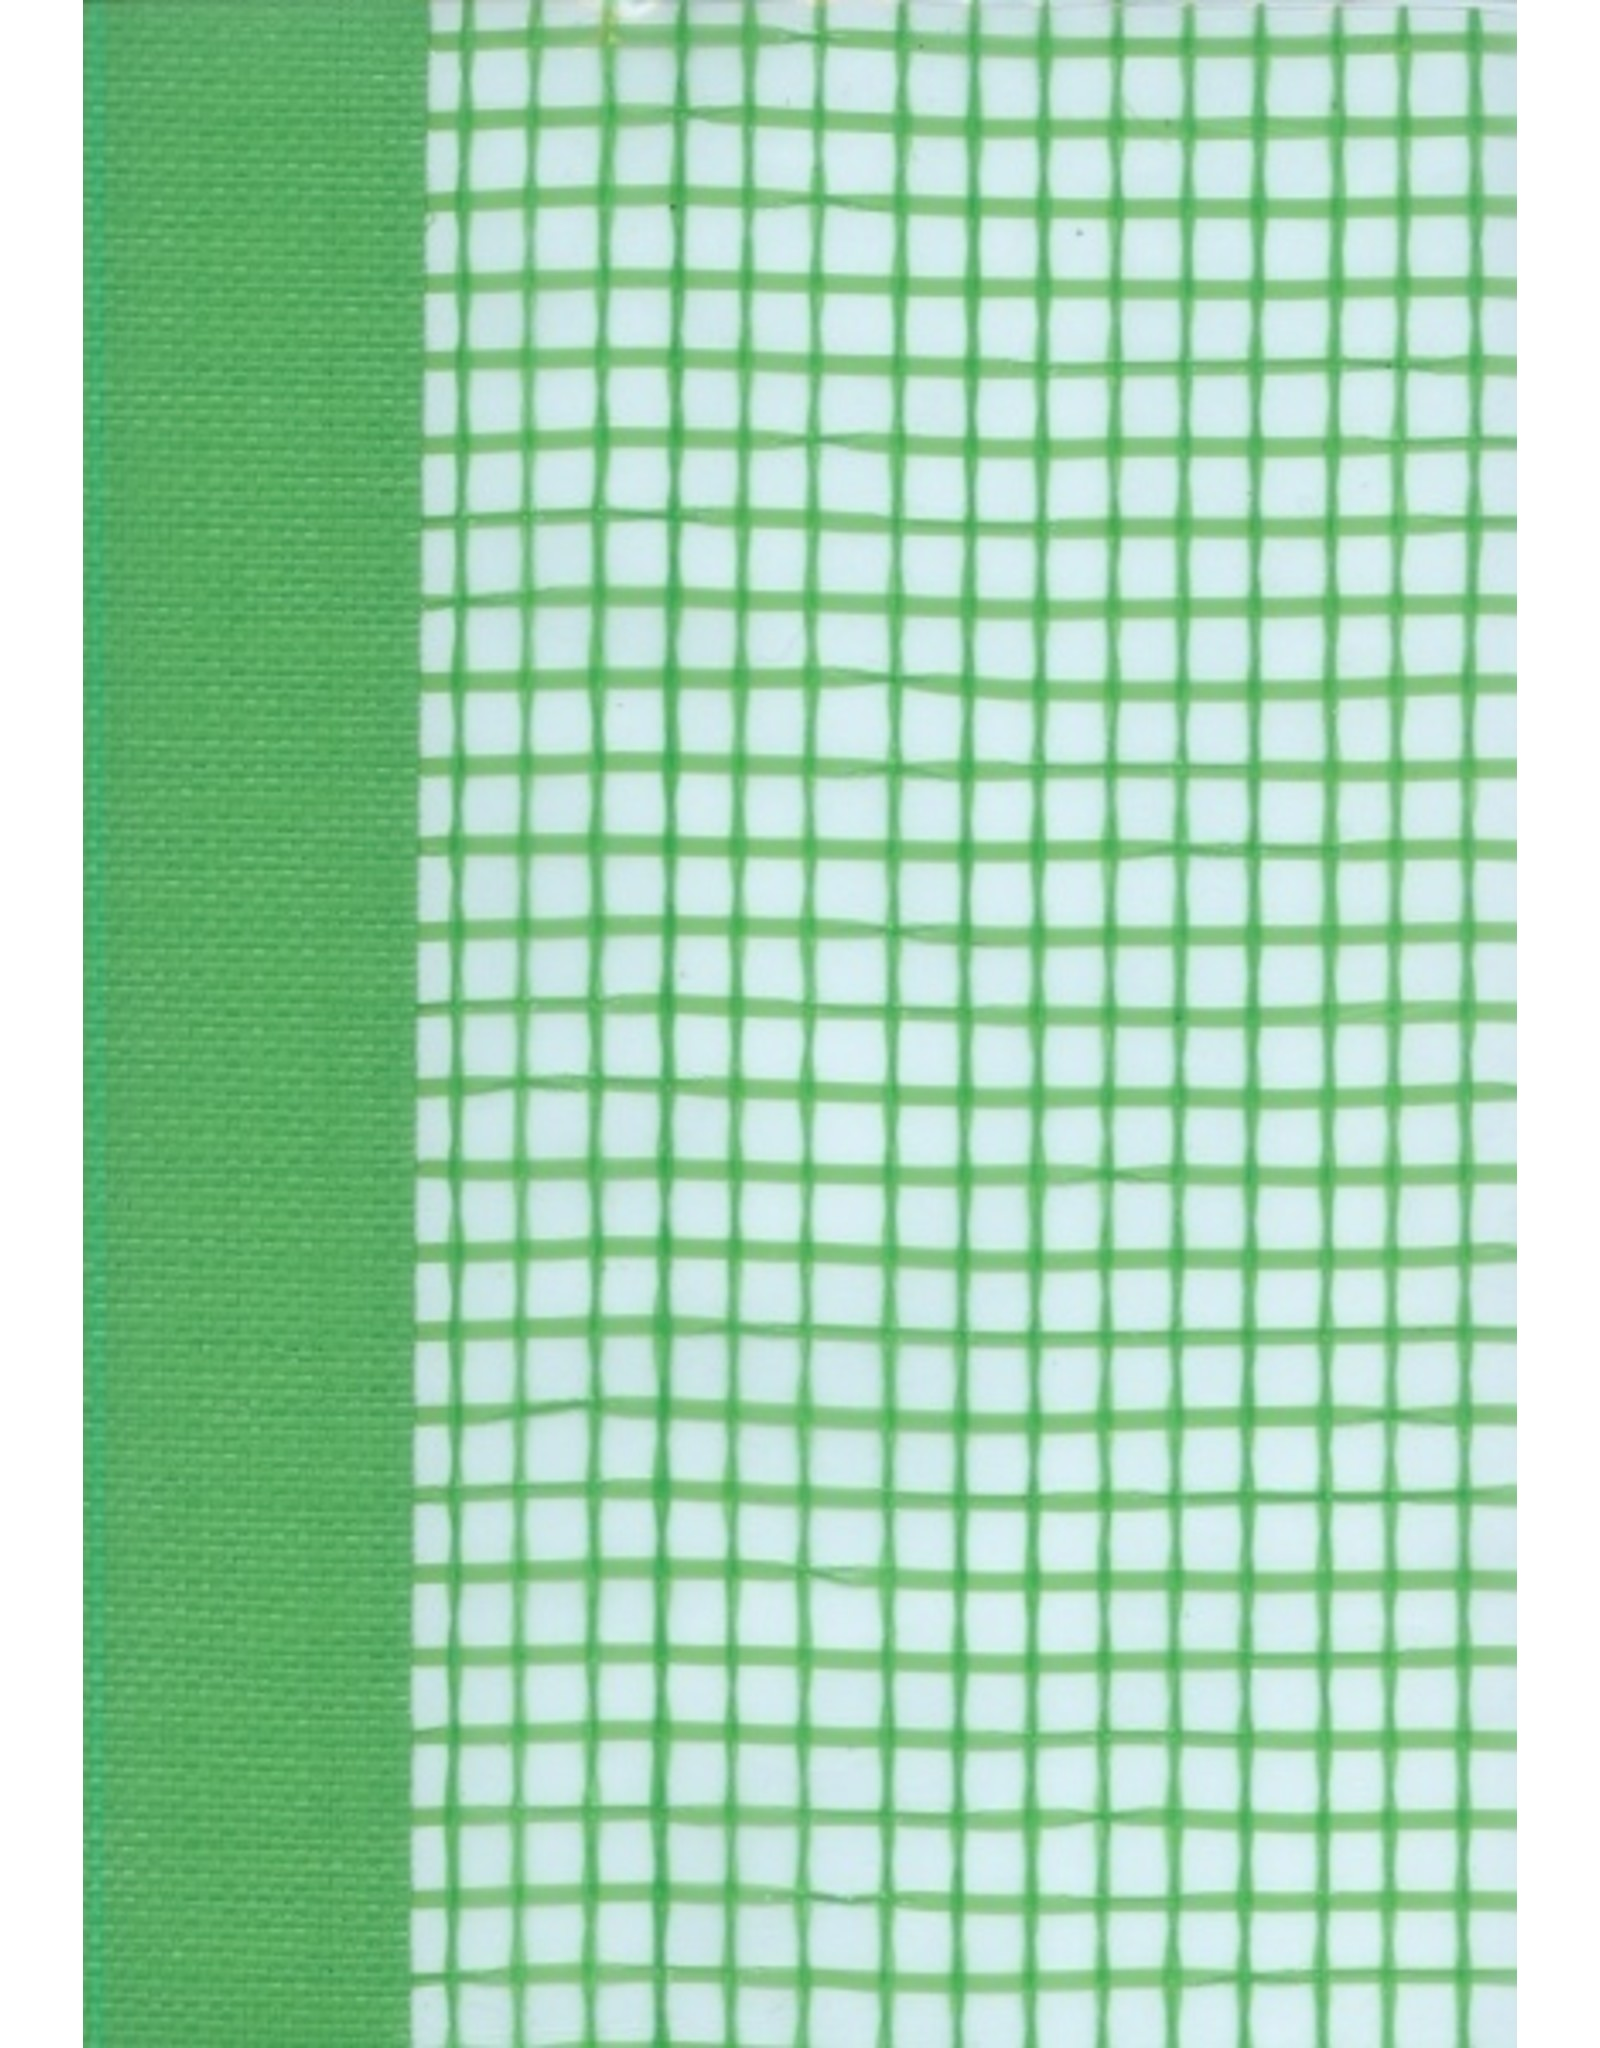 Overige Plastic gewapend groen 3m br. - 1 Meter